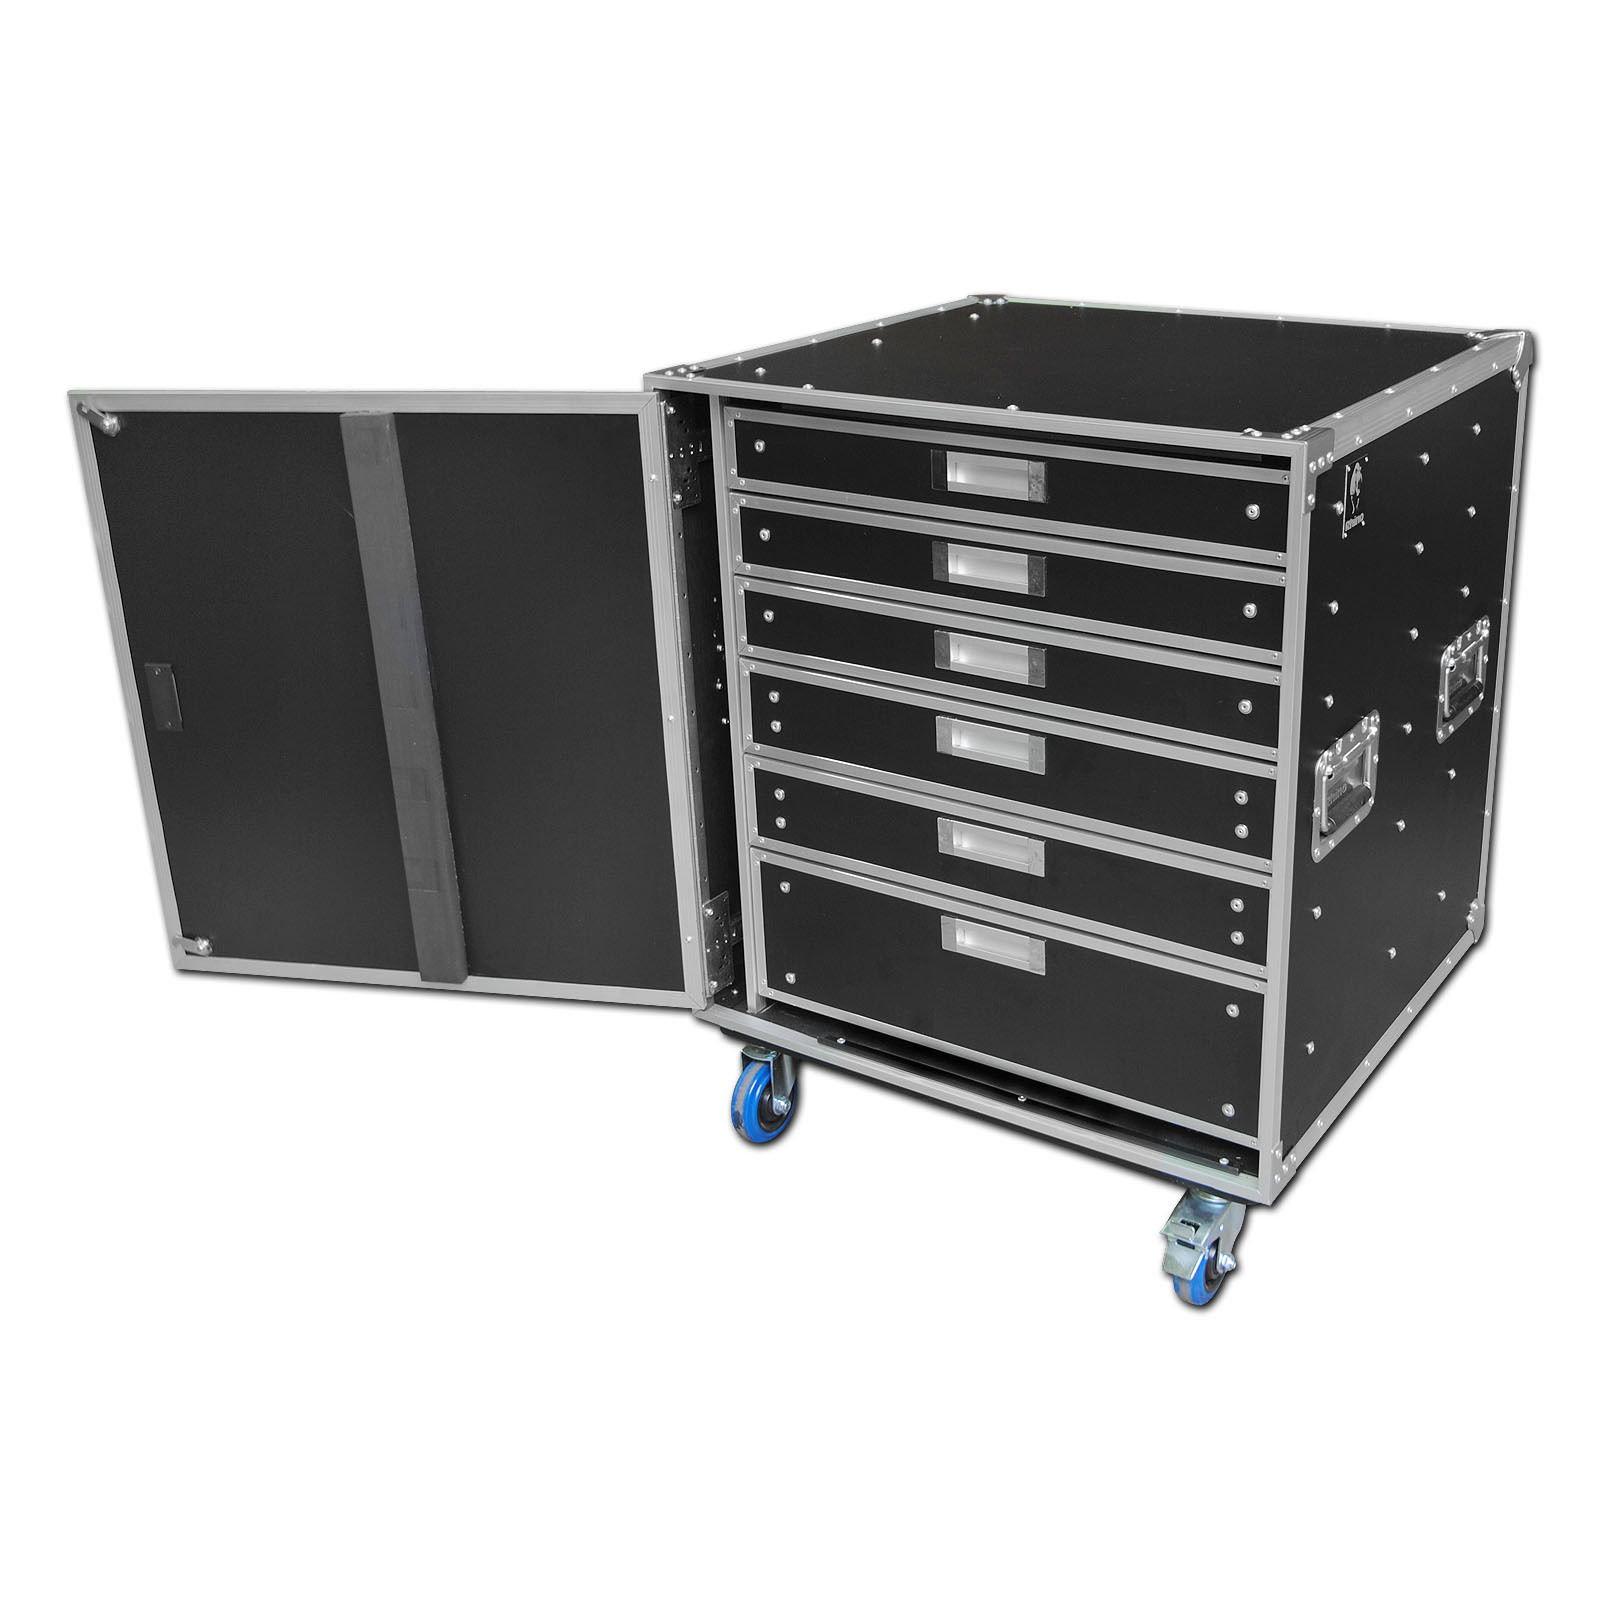 Rhino Production Flight Case With 6 Storage Drawers